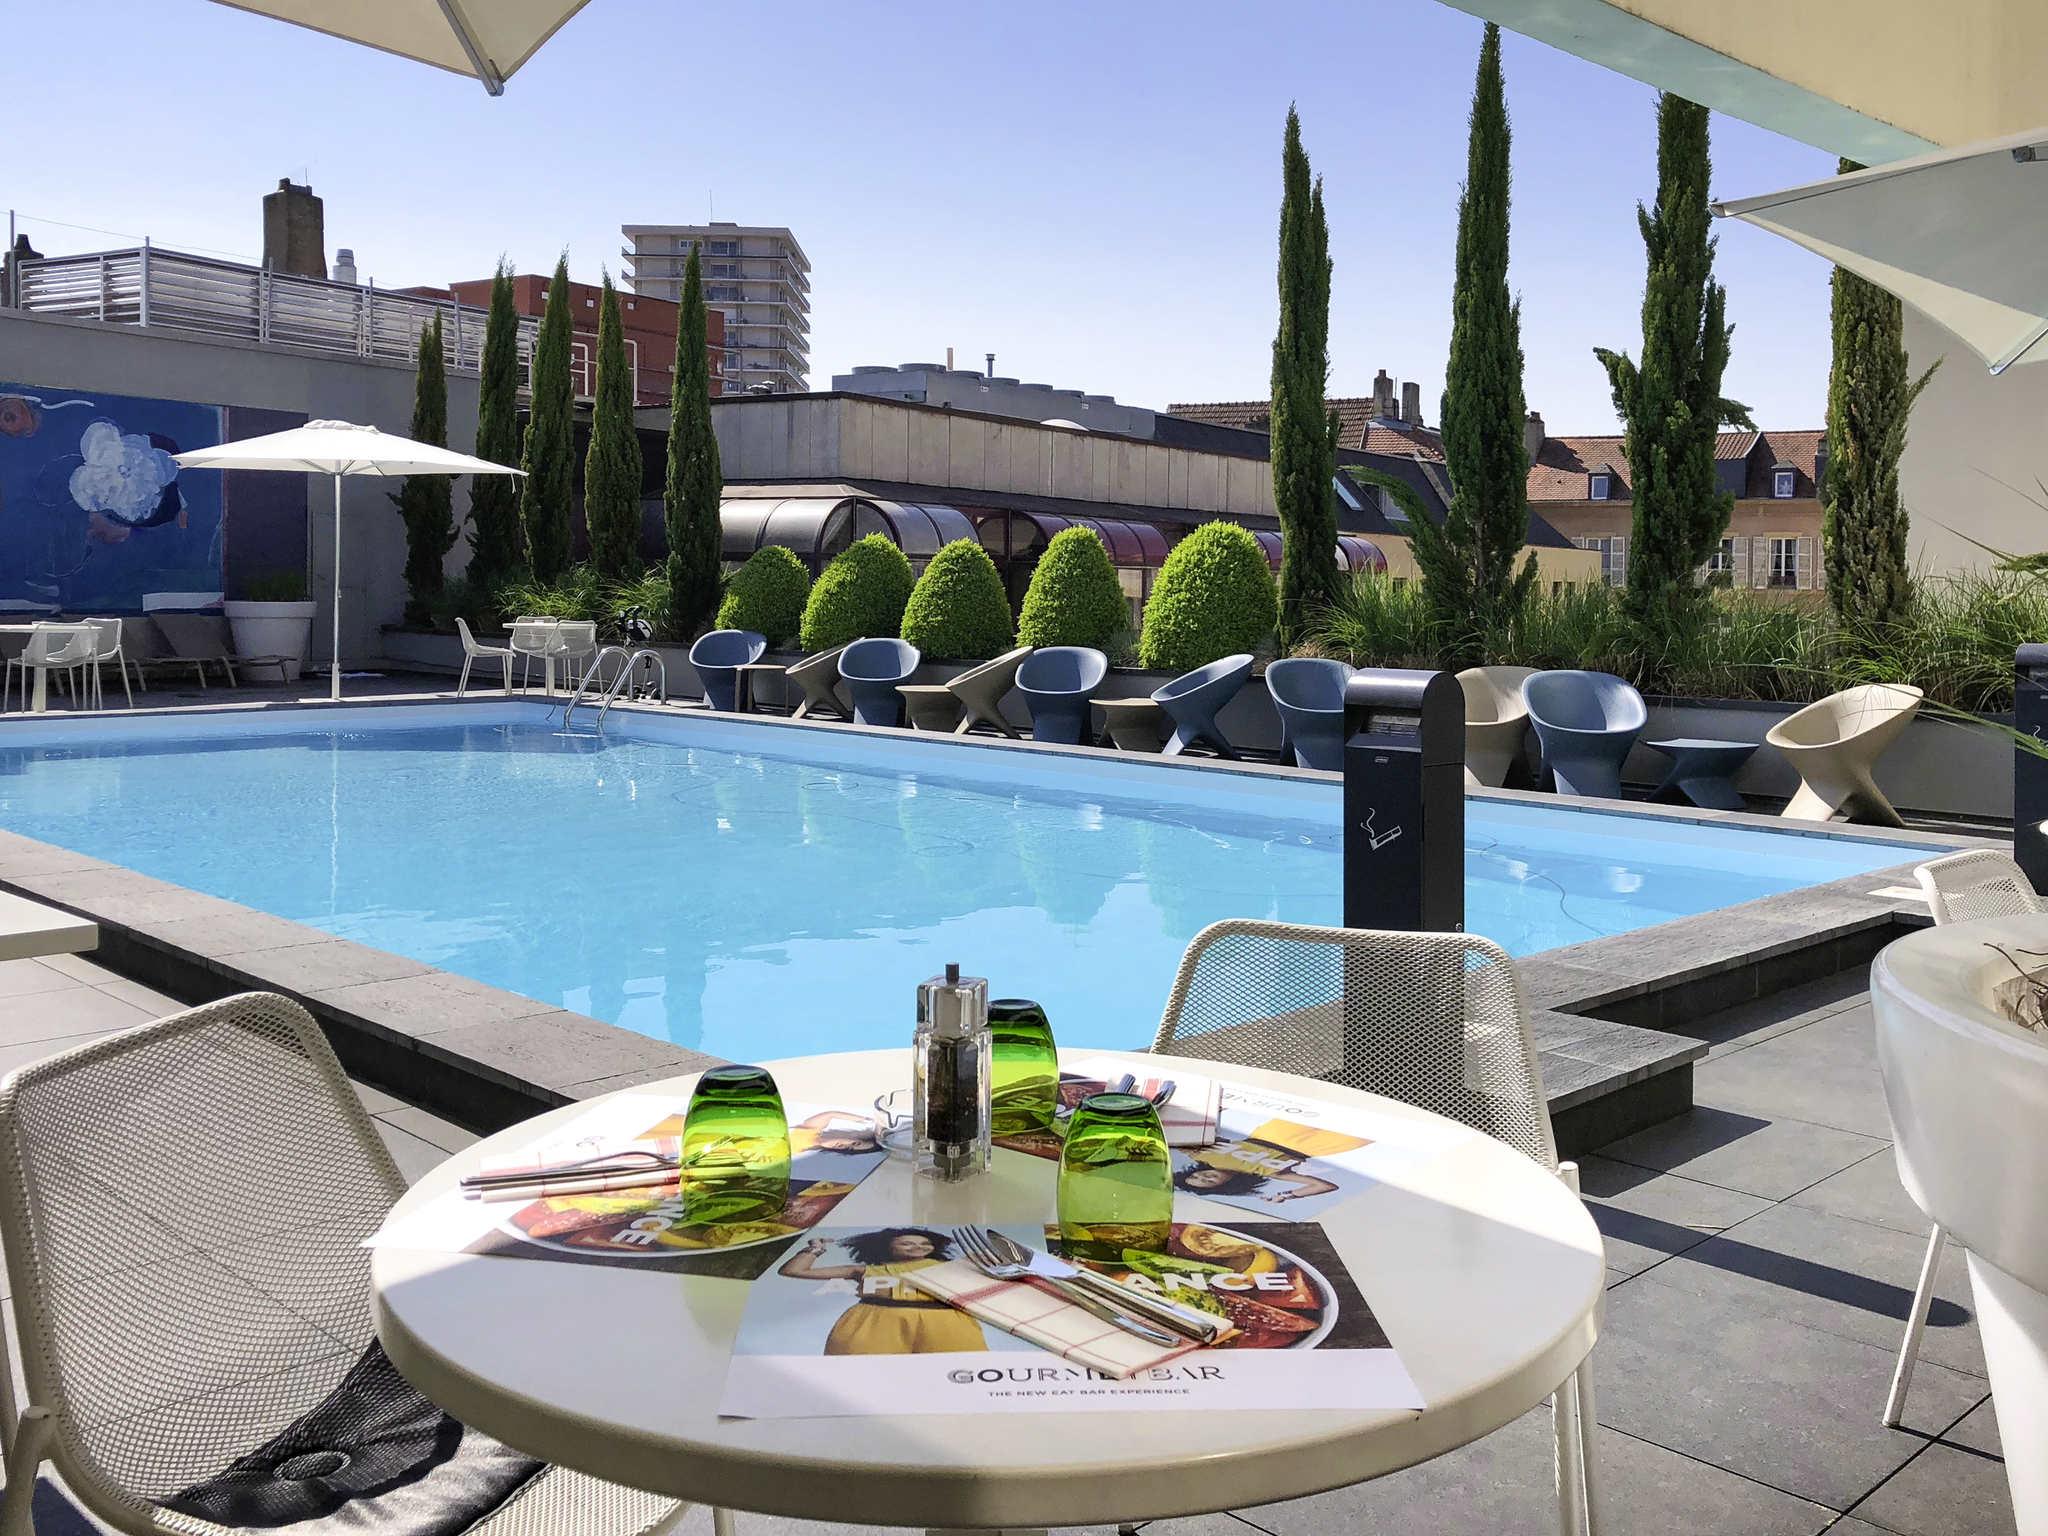 Hotell – Novotel Metz Centre